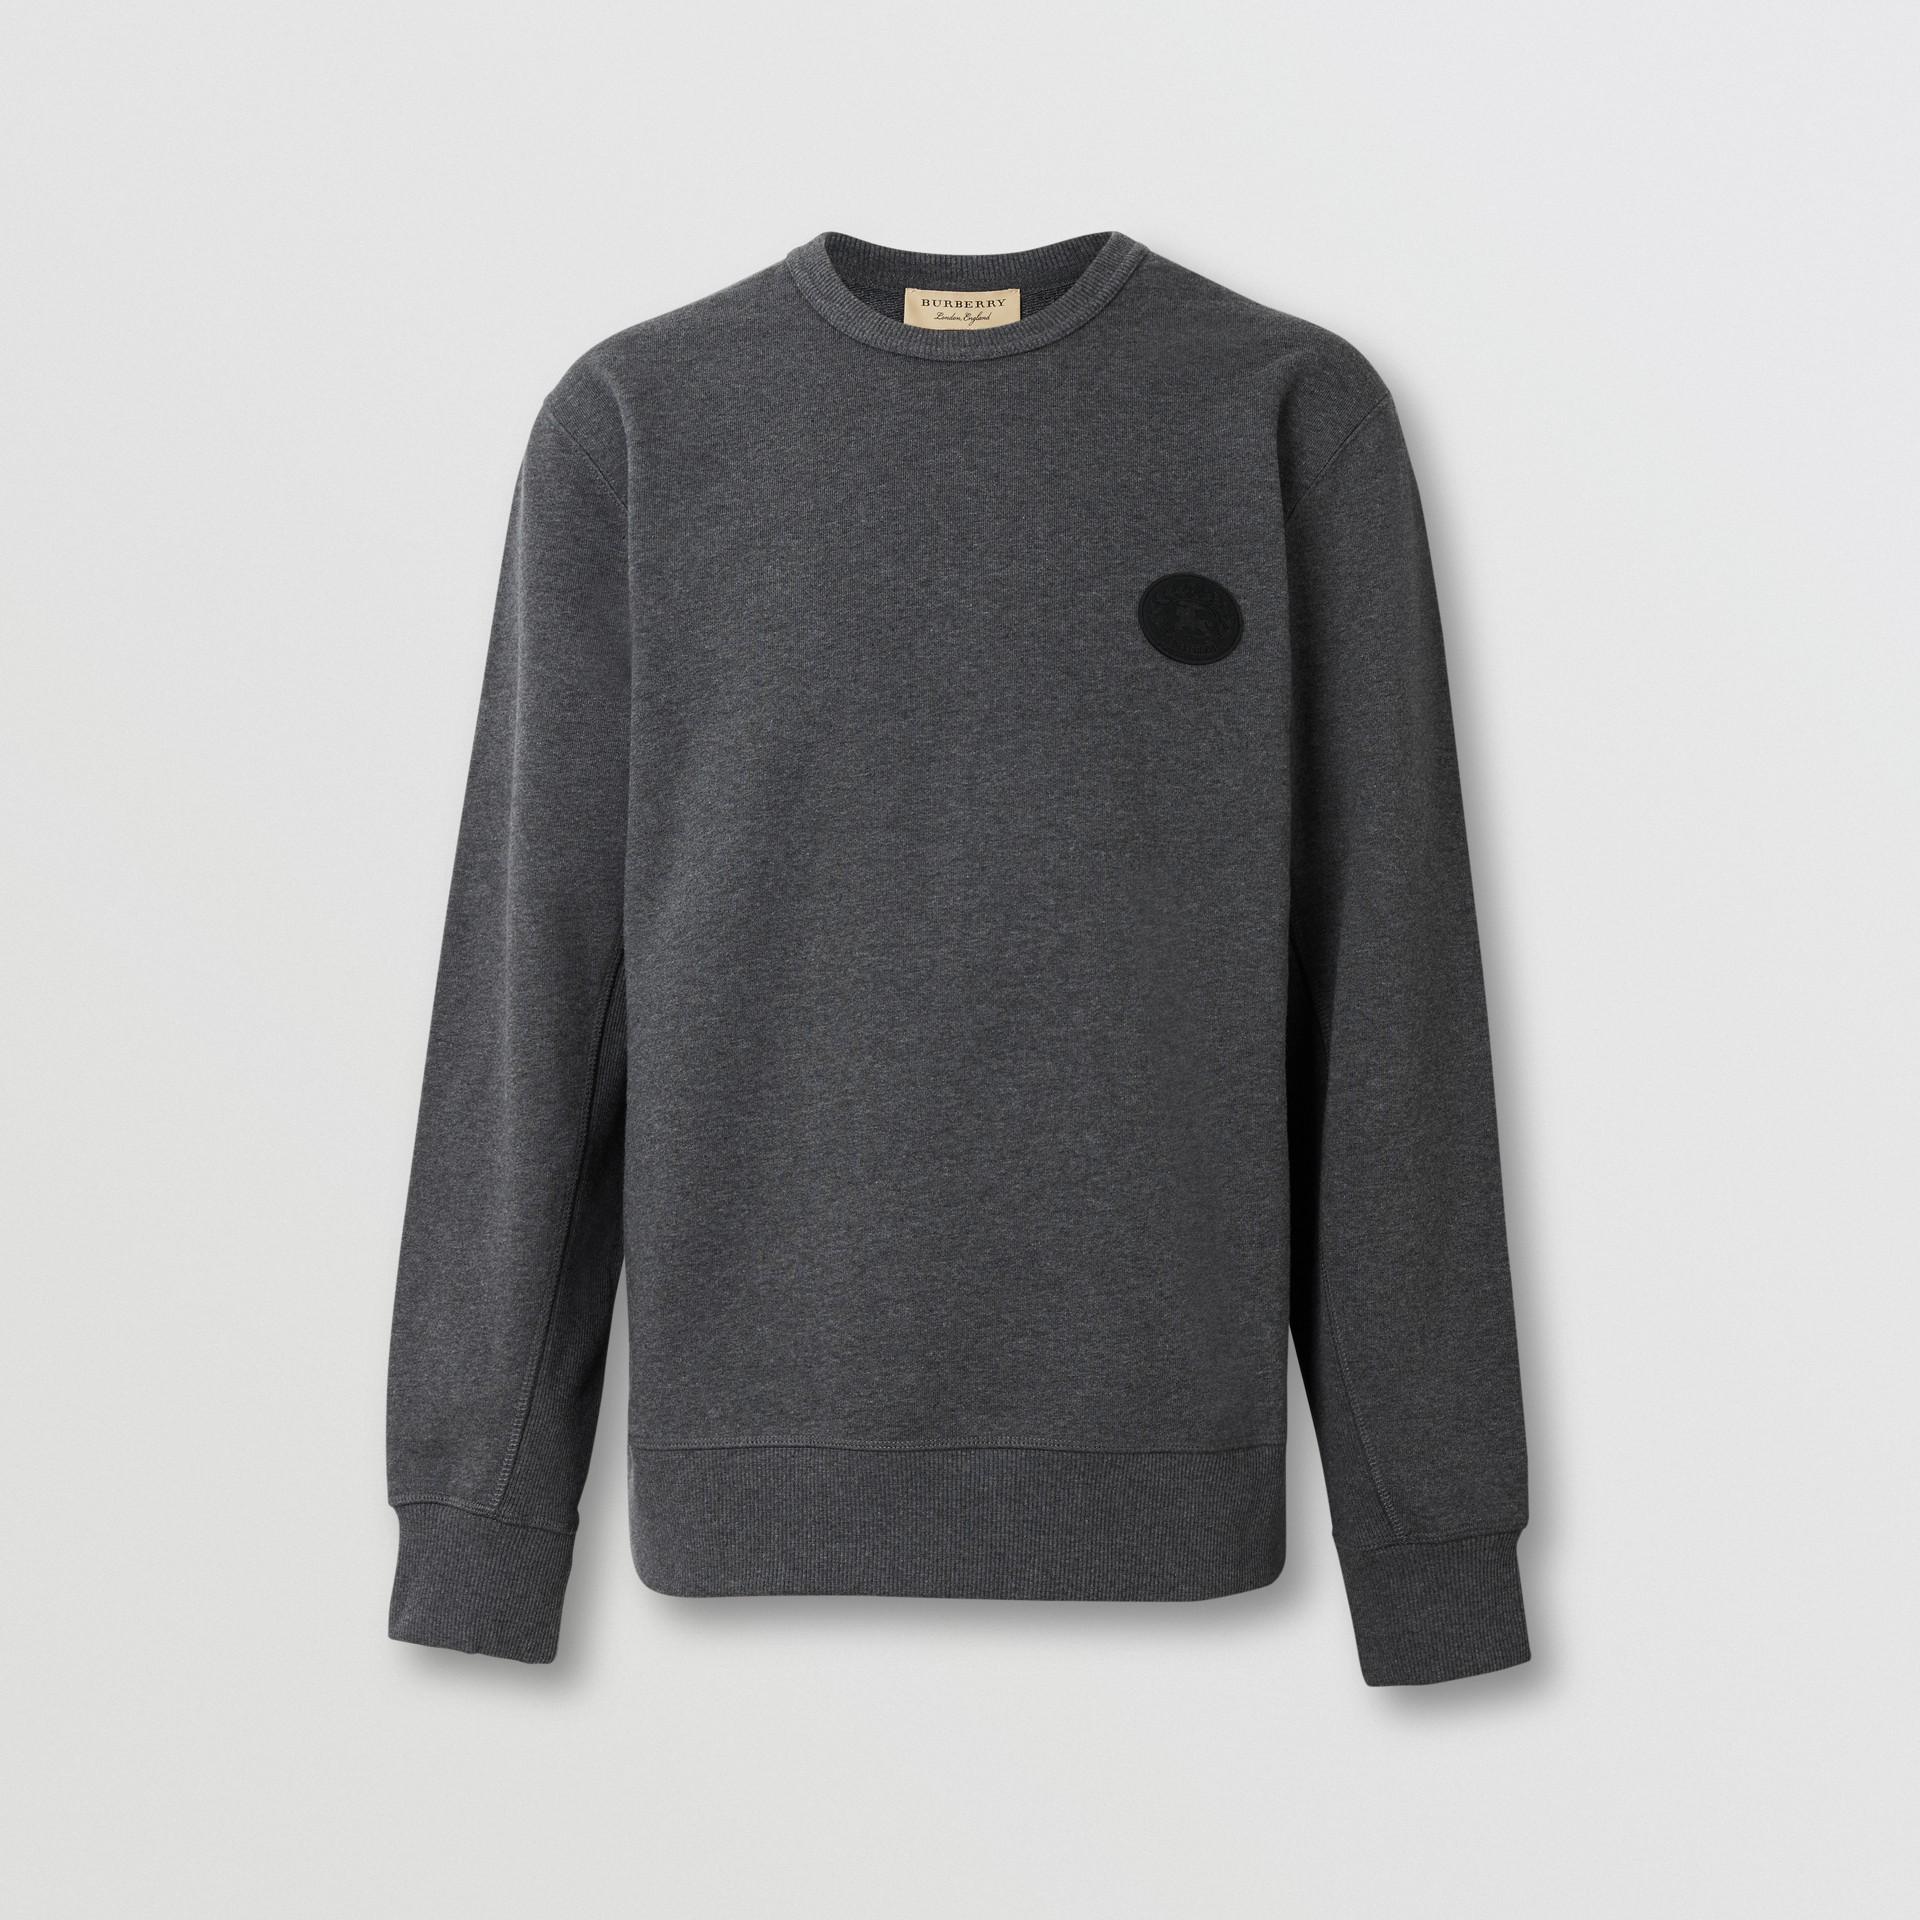 Embroidered Crest Cotton Sweatshirt in Mid Grey Melange - Men | Burberry United Kingdom - gallery image 3